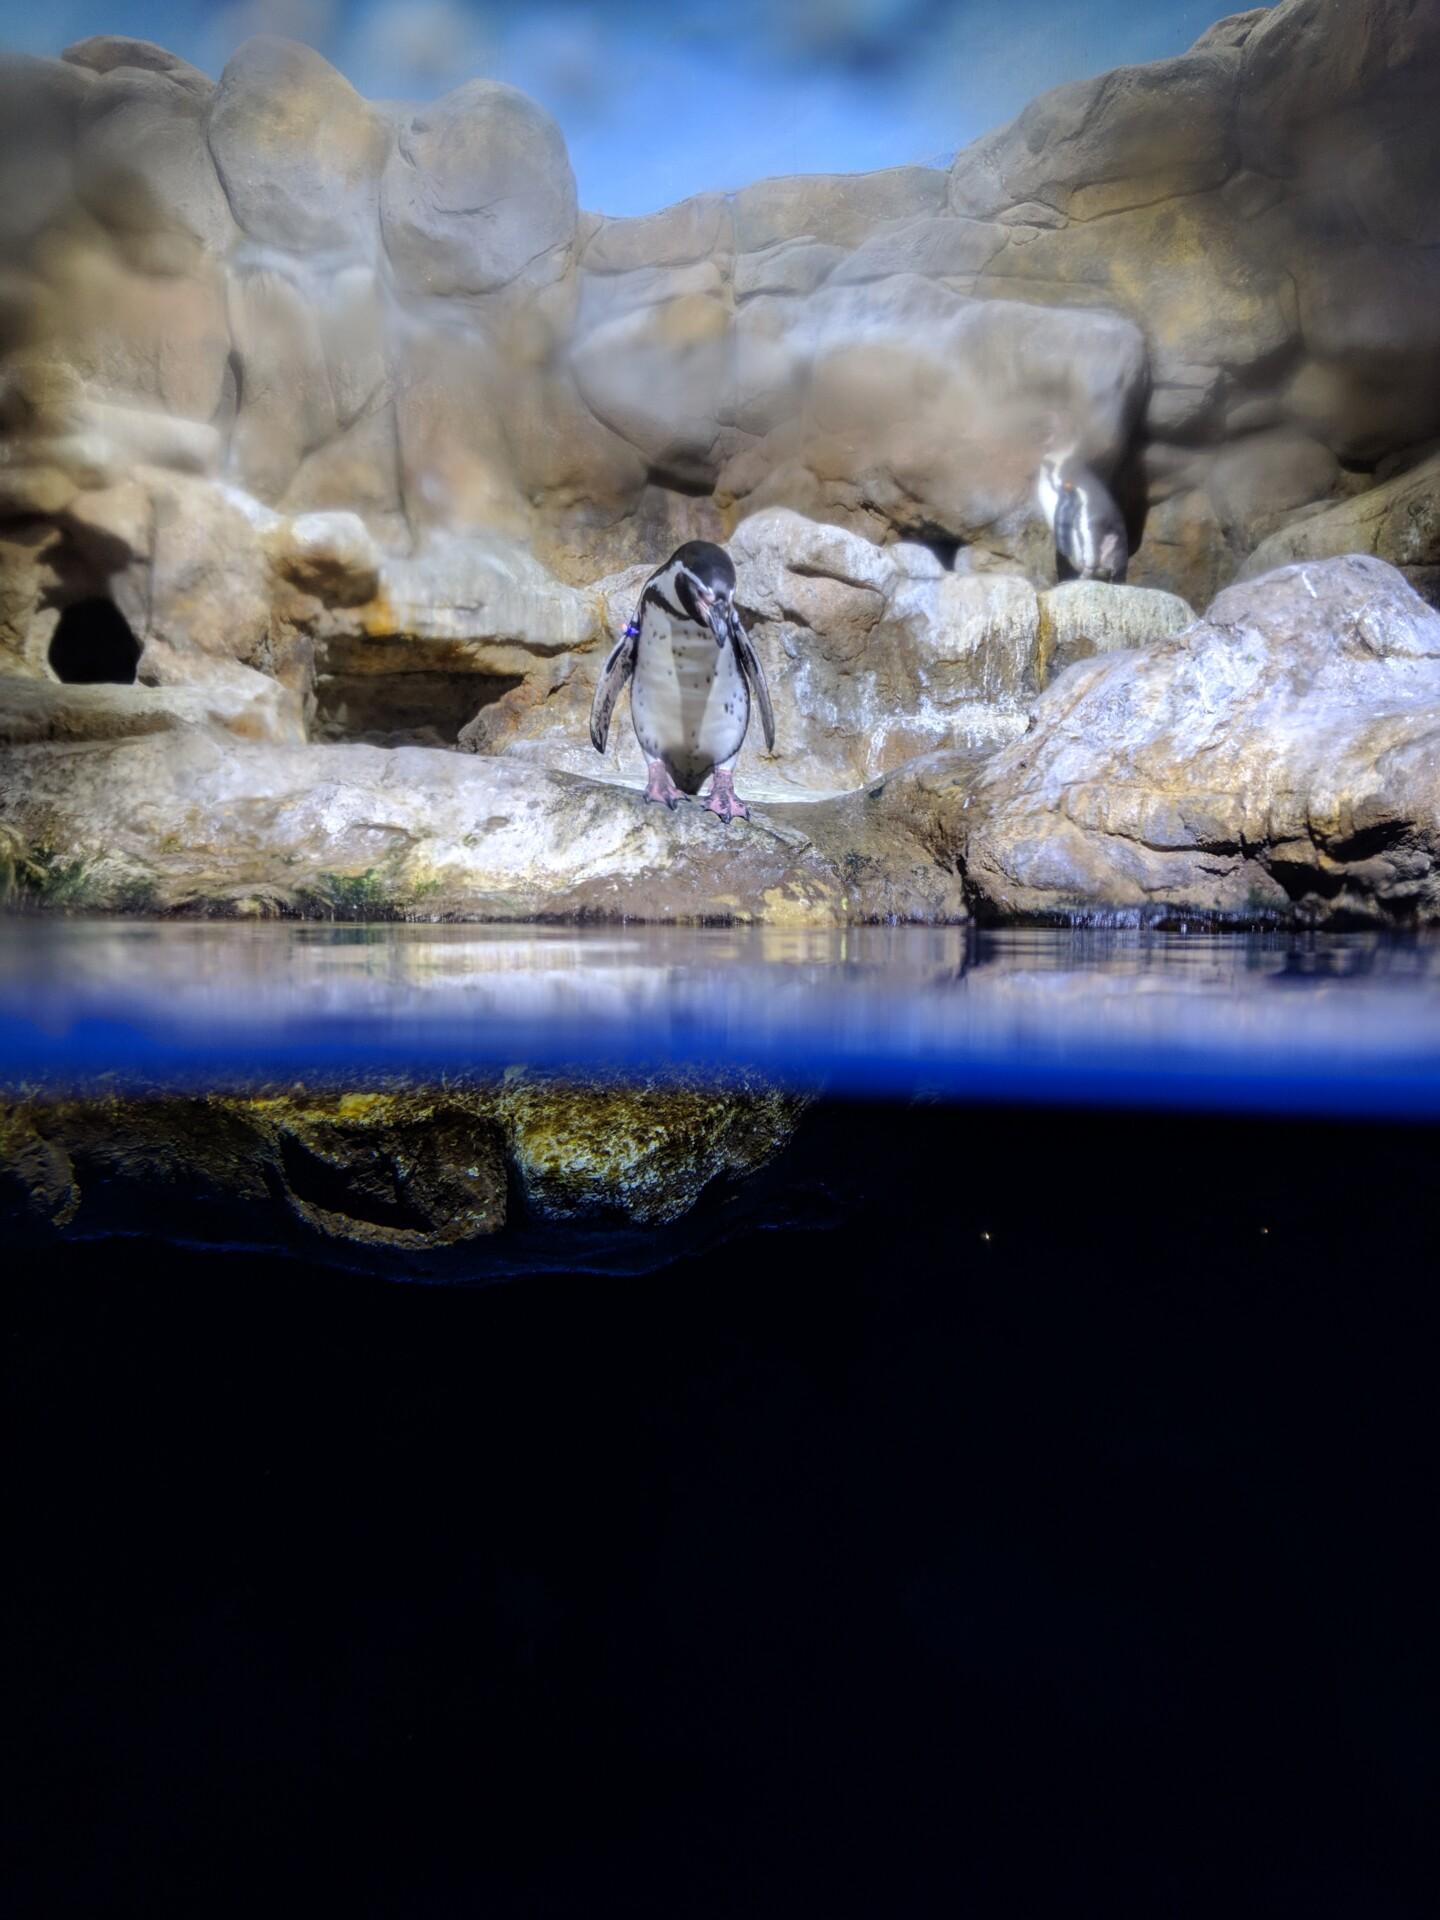 google pixel 3 camera sample penguin at zoo